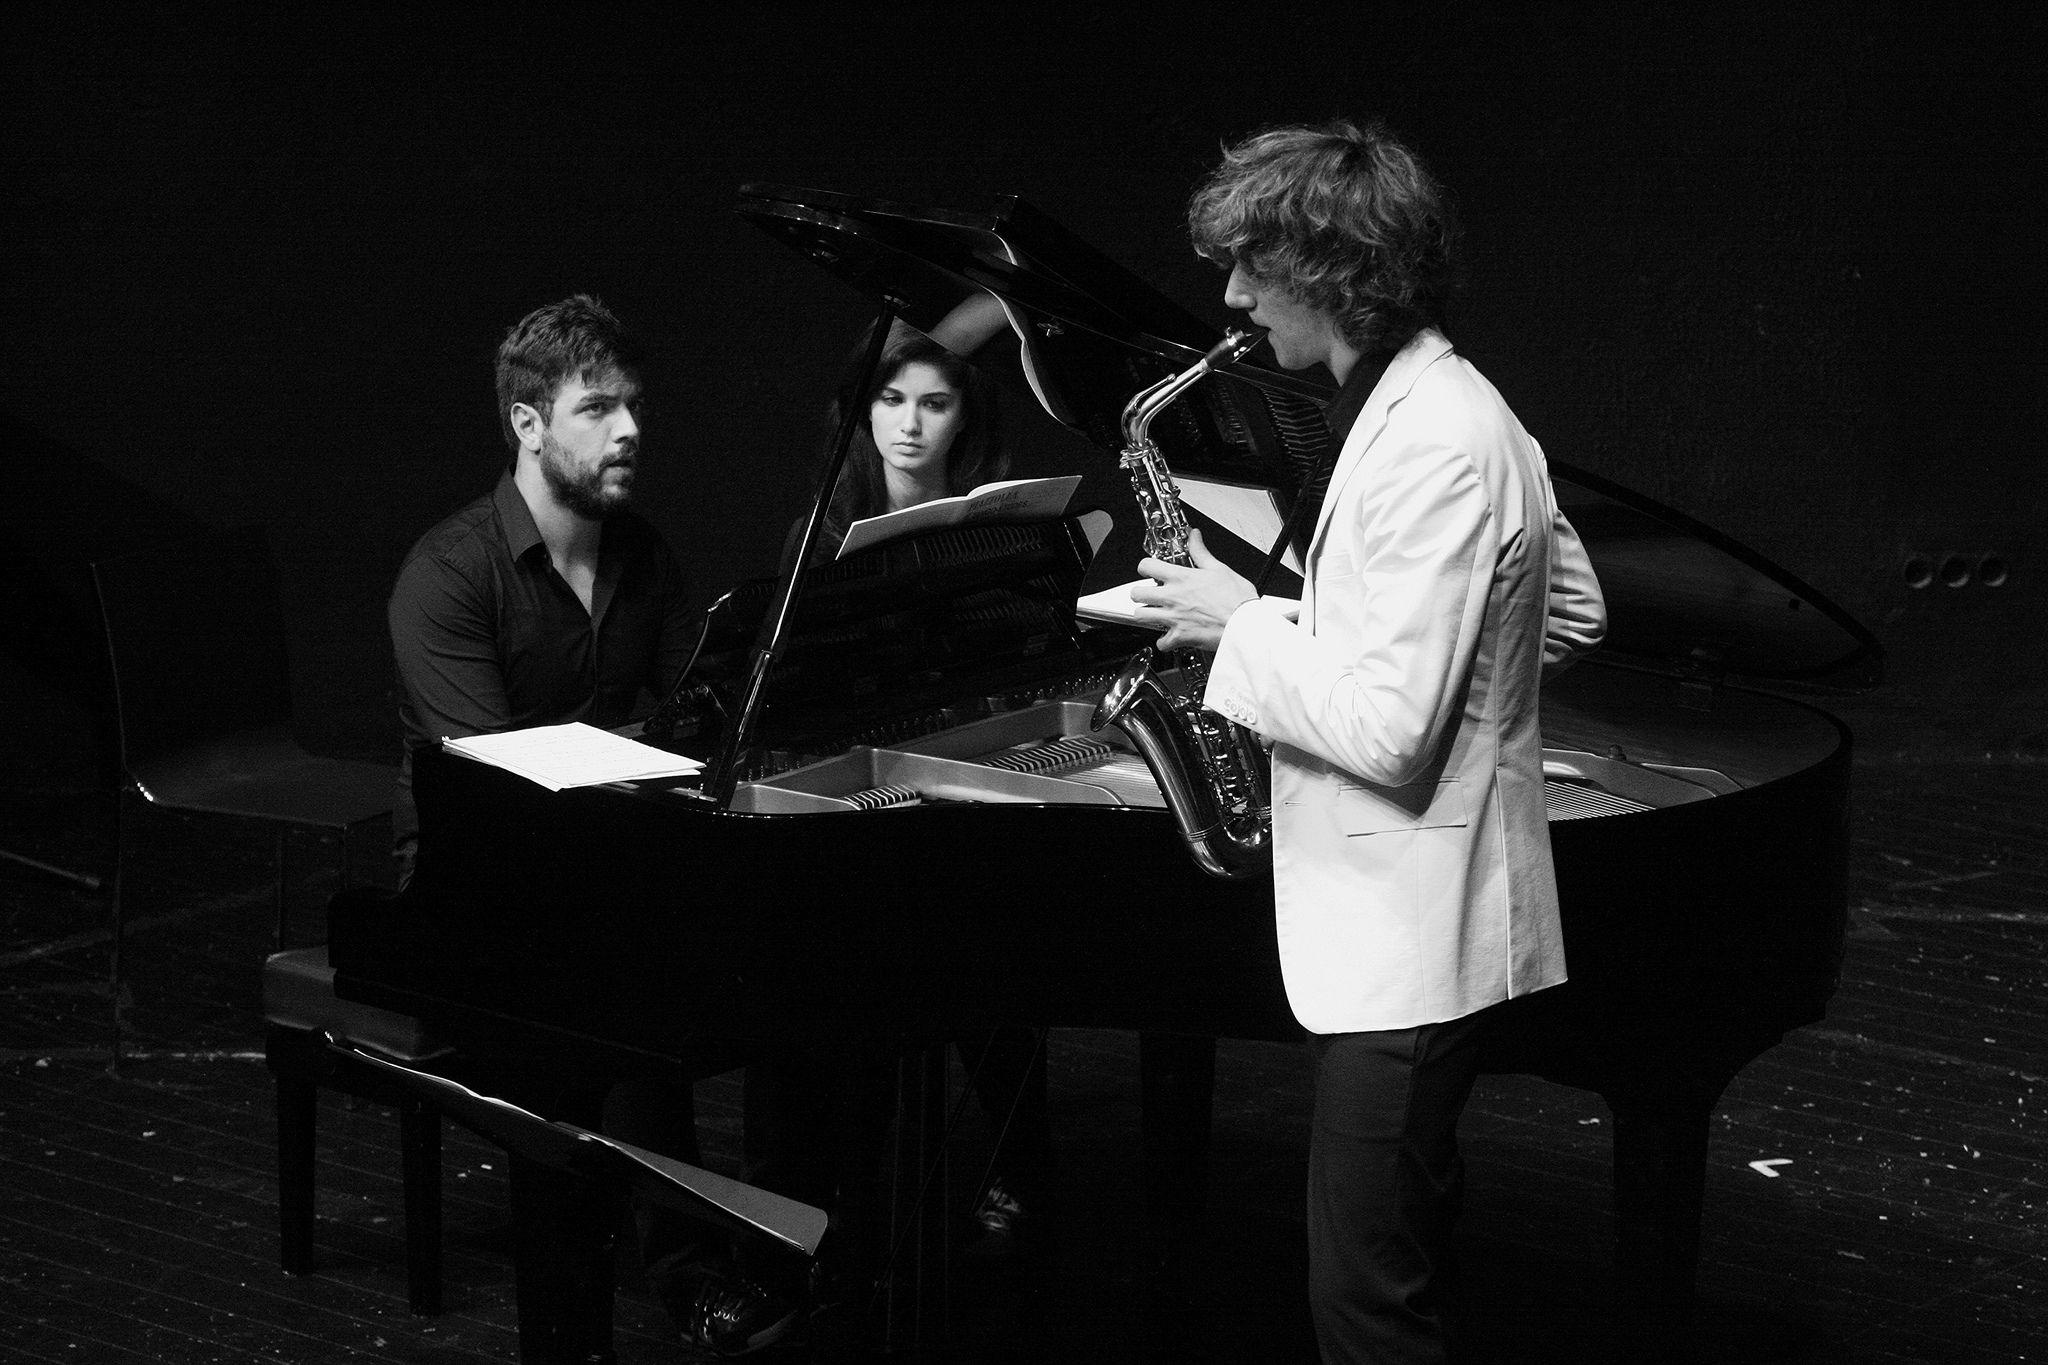 Jacopo Taddei, sassofono, Luigi Nicolardi, pianoforte